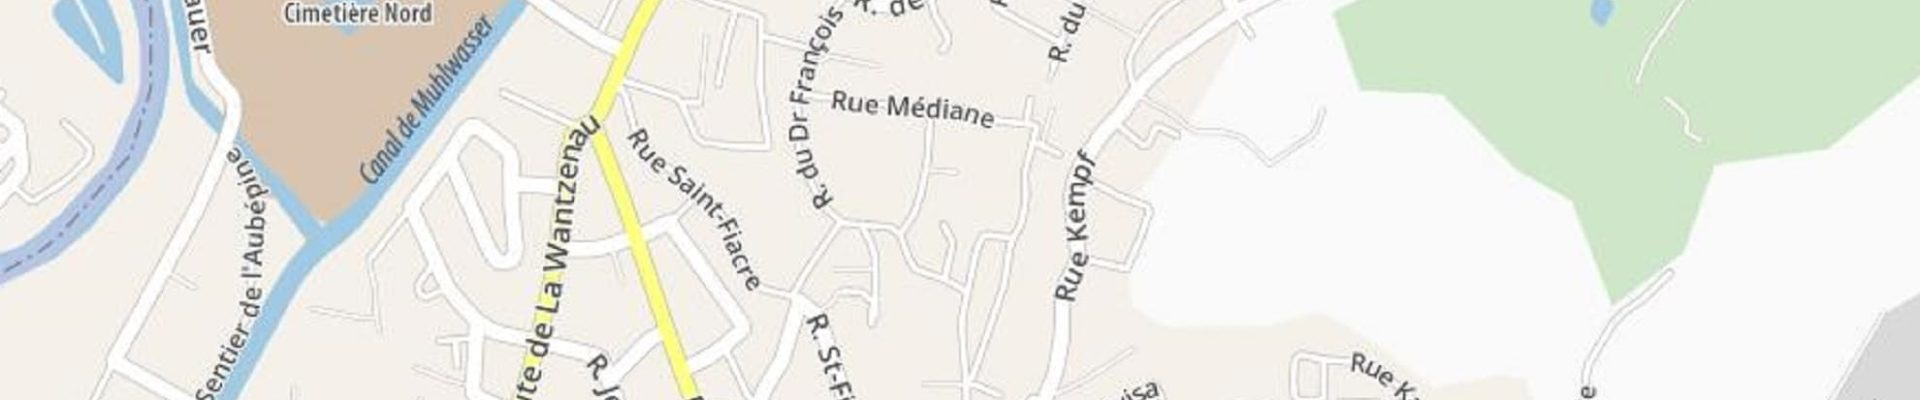 Les odonymes de notre quartier Robertsau – Wacken